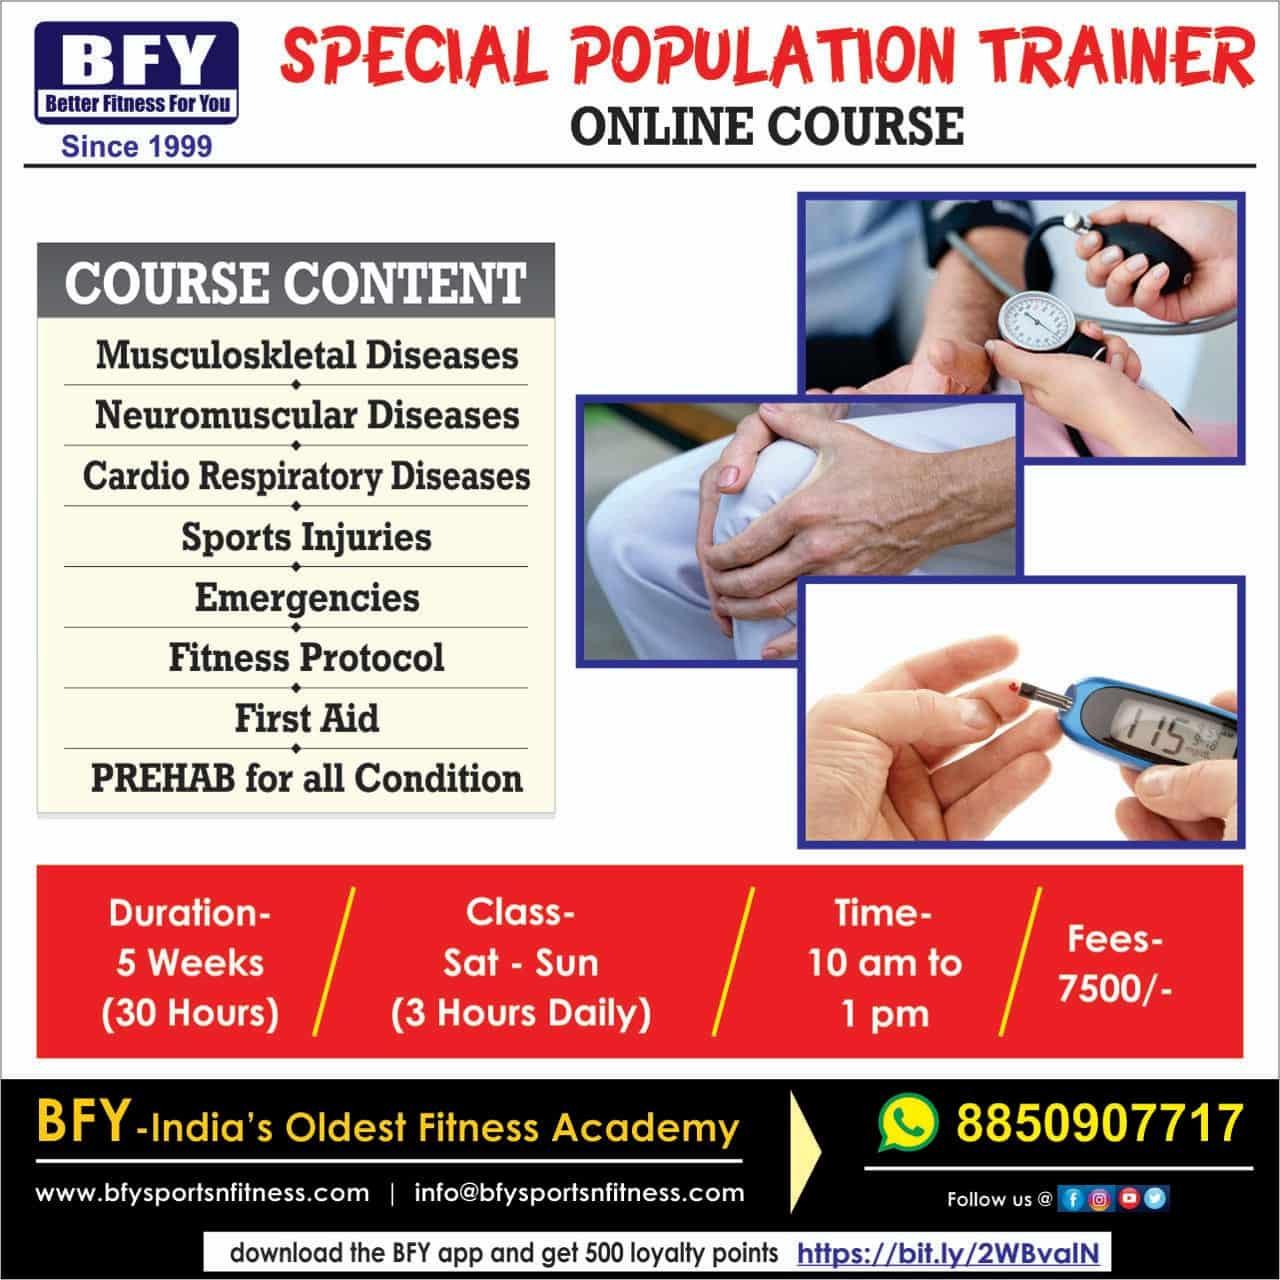 special population trainer_1-min.jpeg